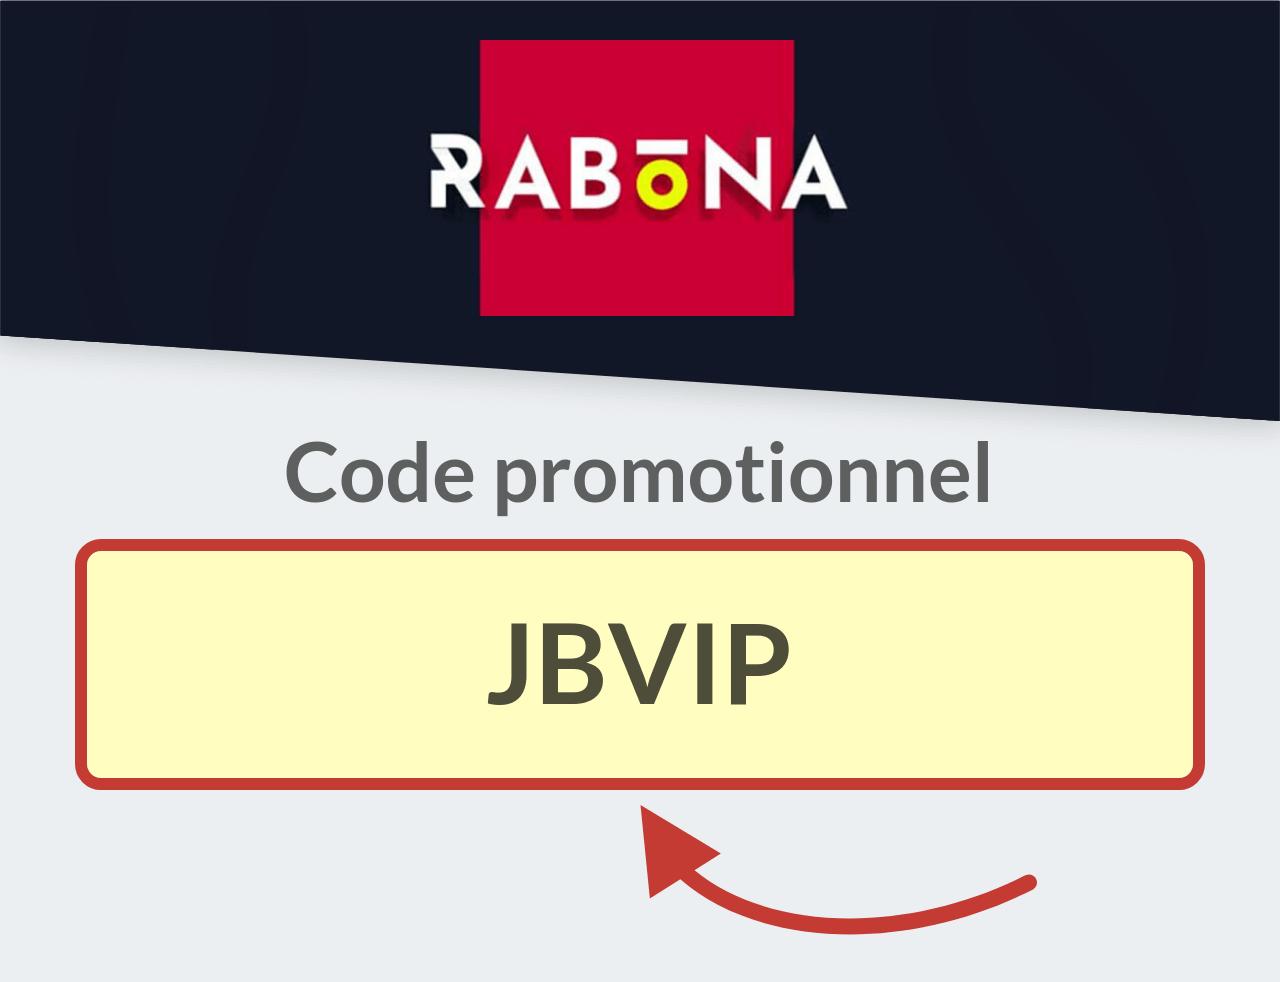 Code Promotionnel Rabona